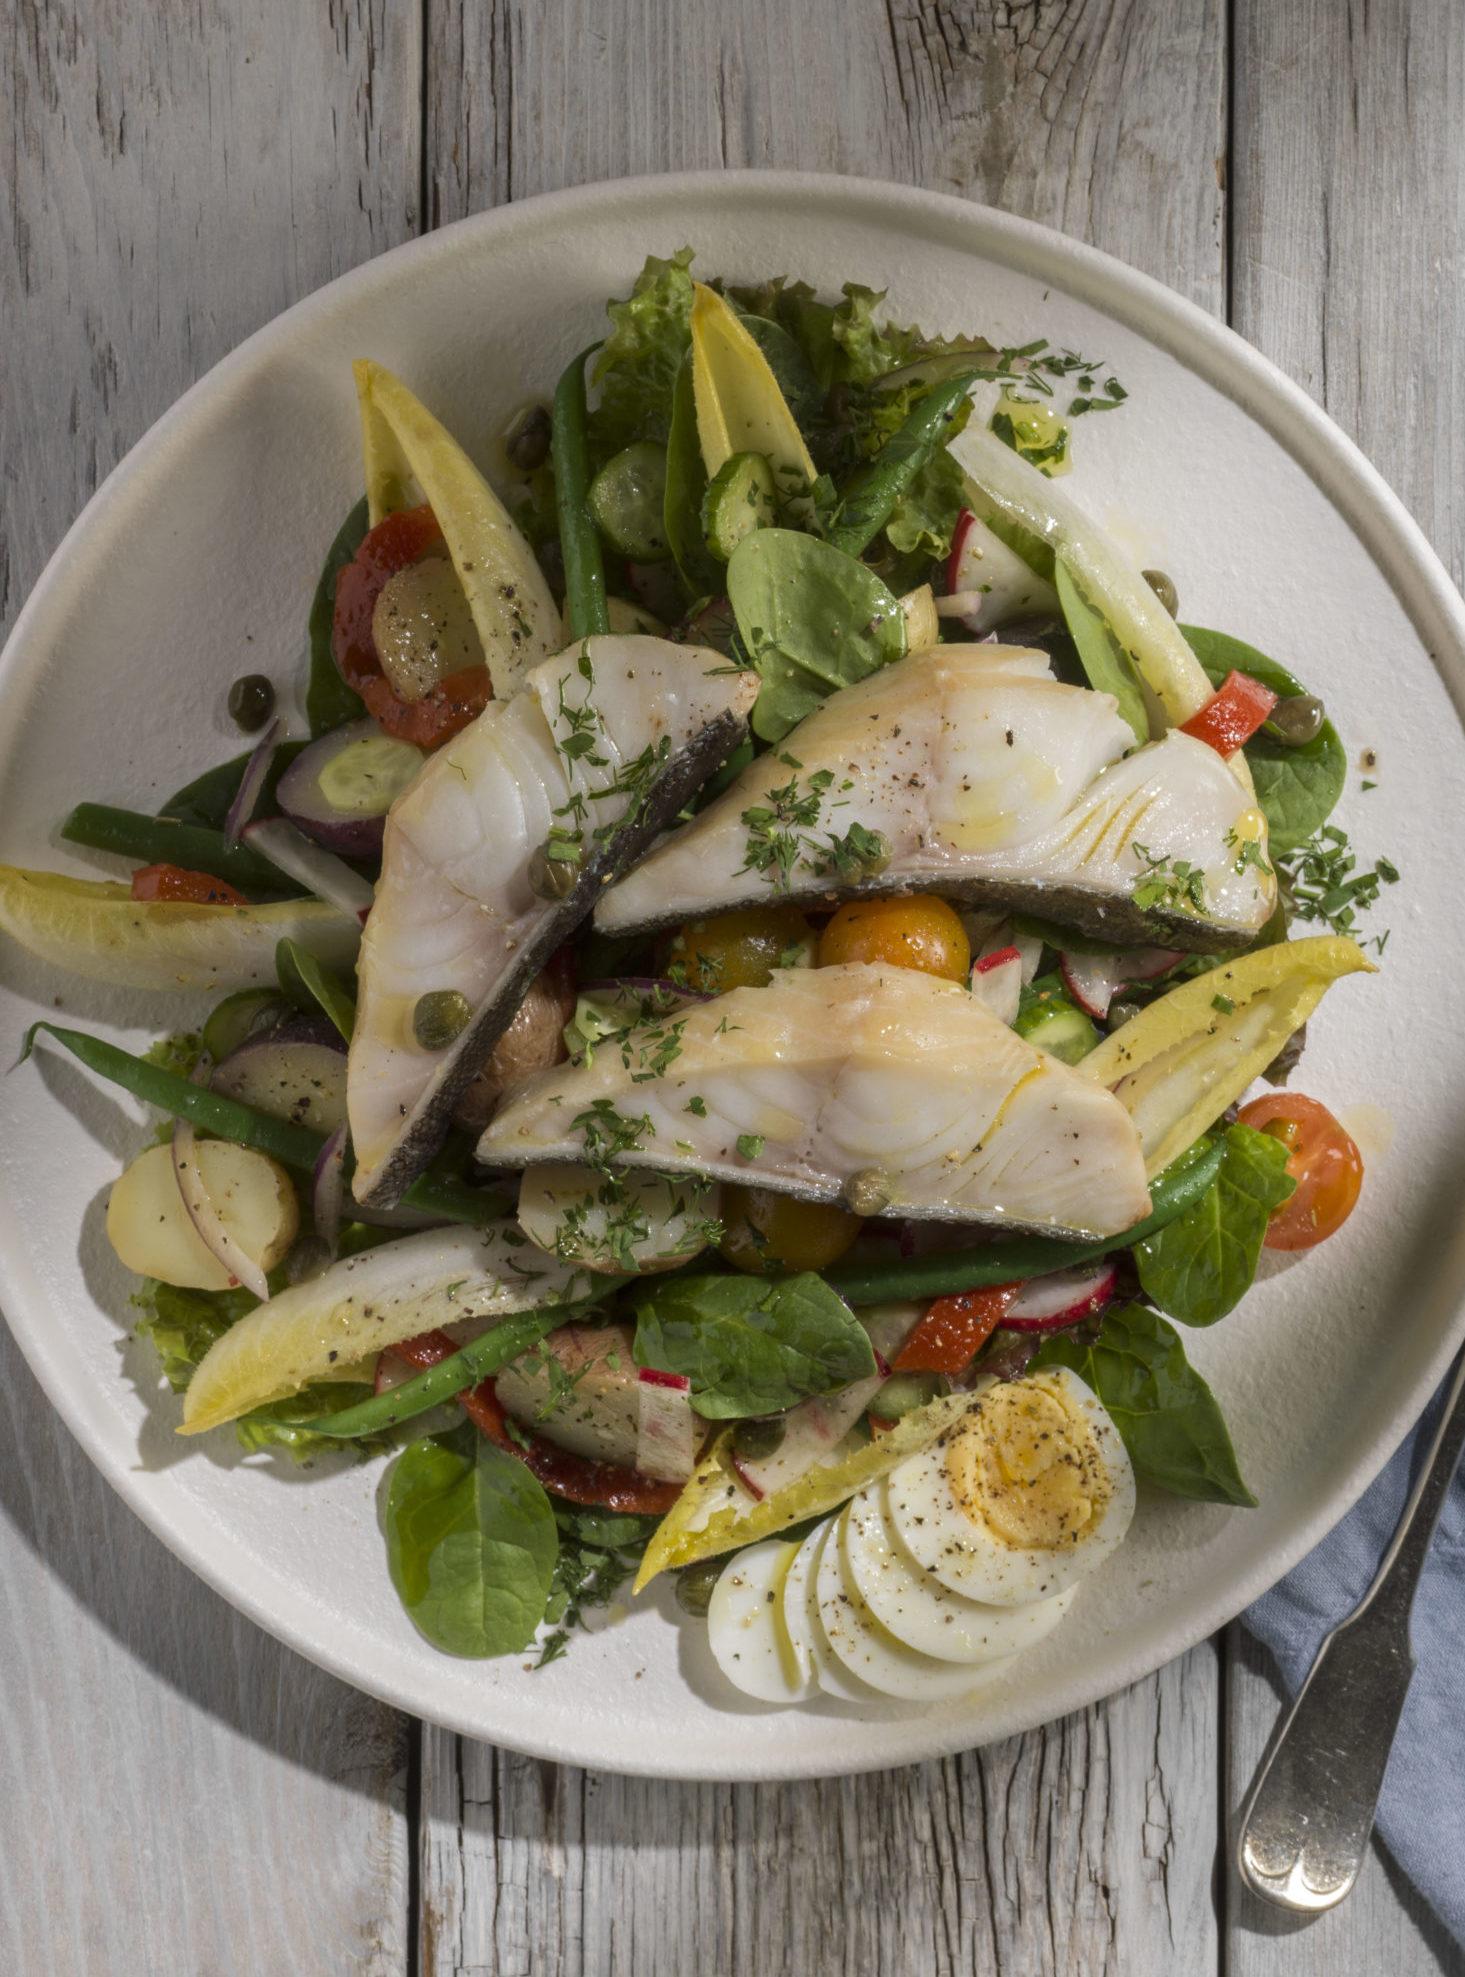 Photo of the Sablefish Nicoise Salad meal